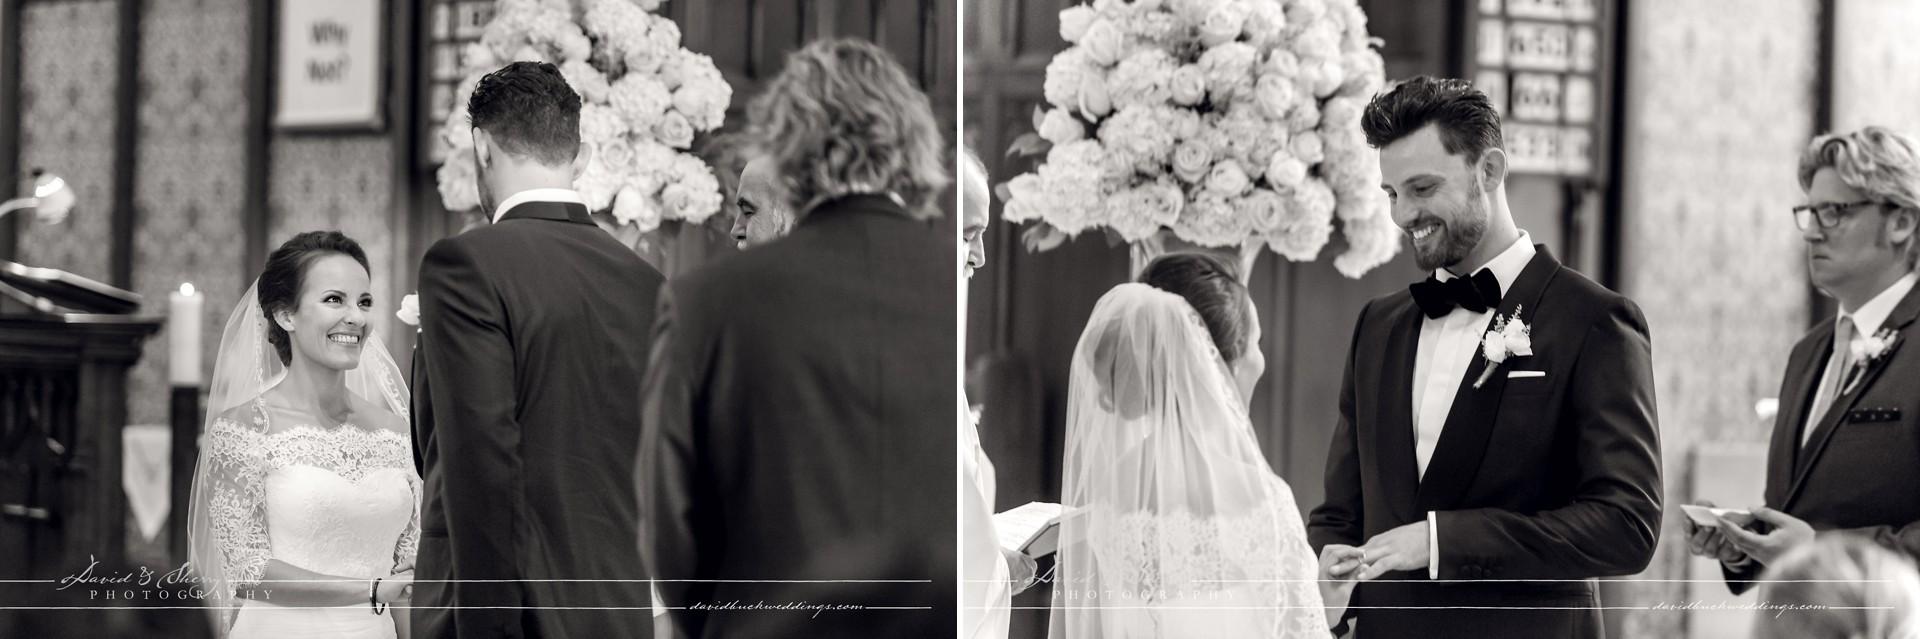 Sarnia_Wedding_Photography_017